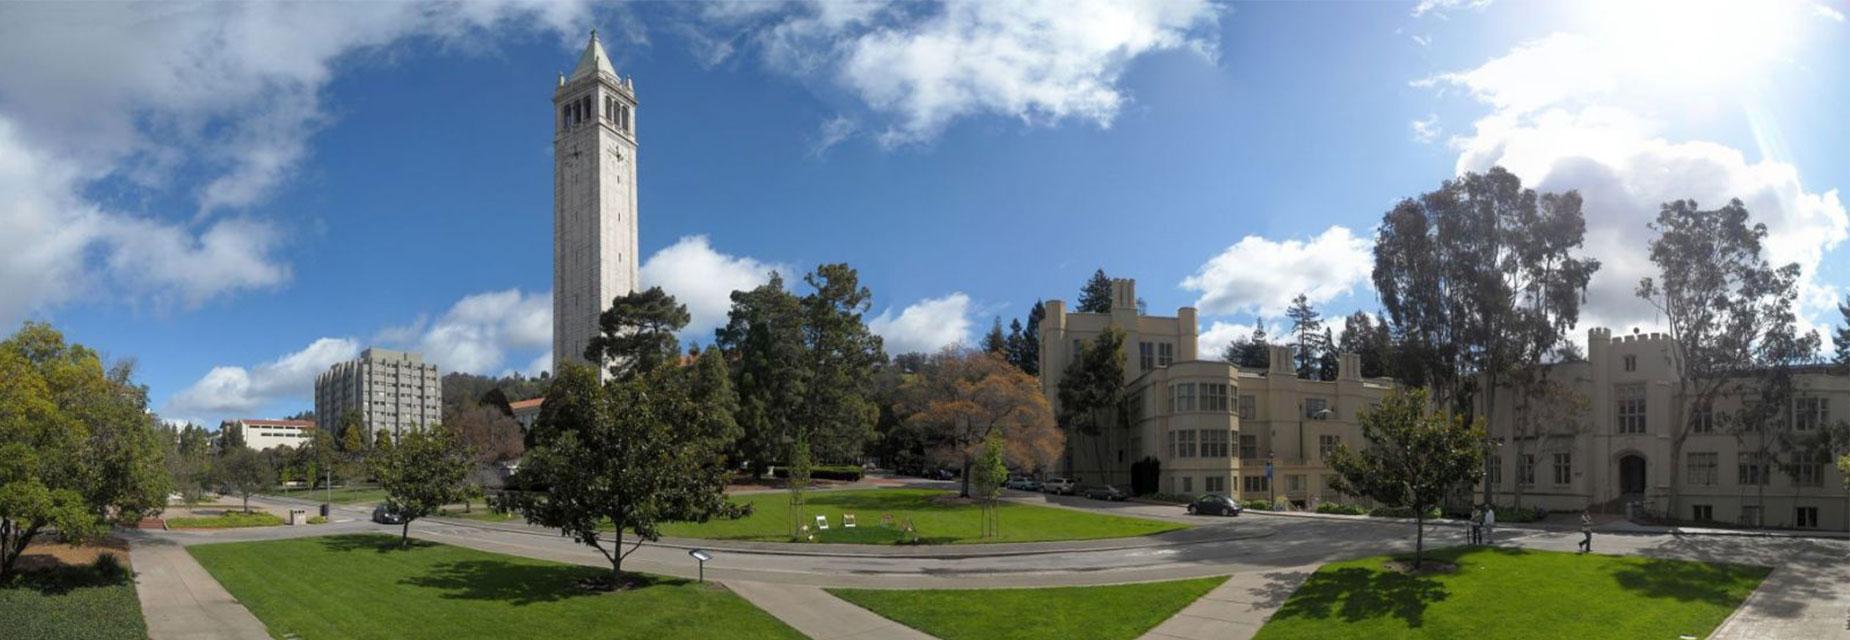 berkeley-university